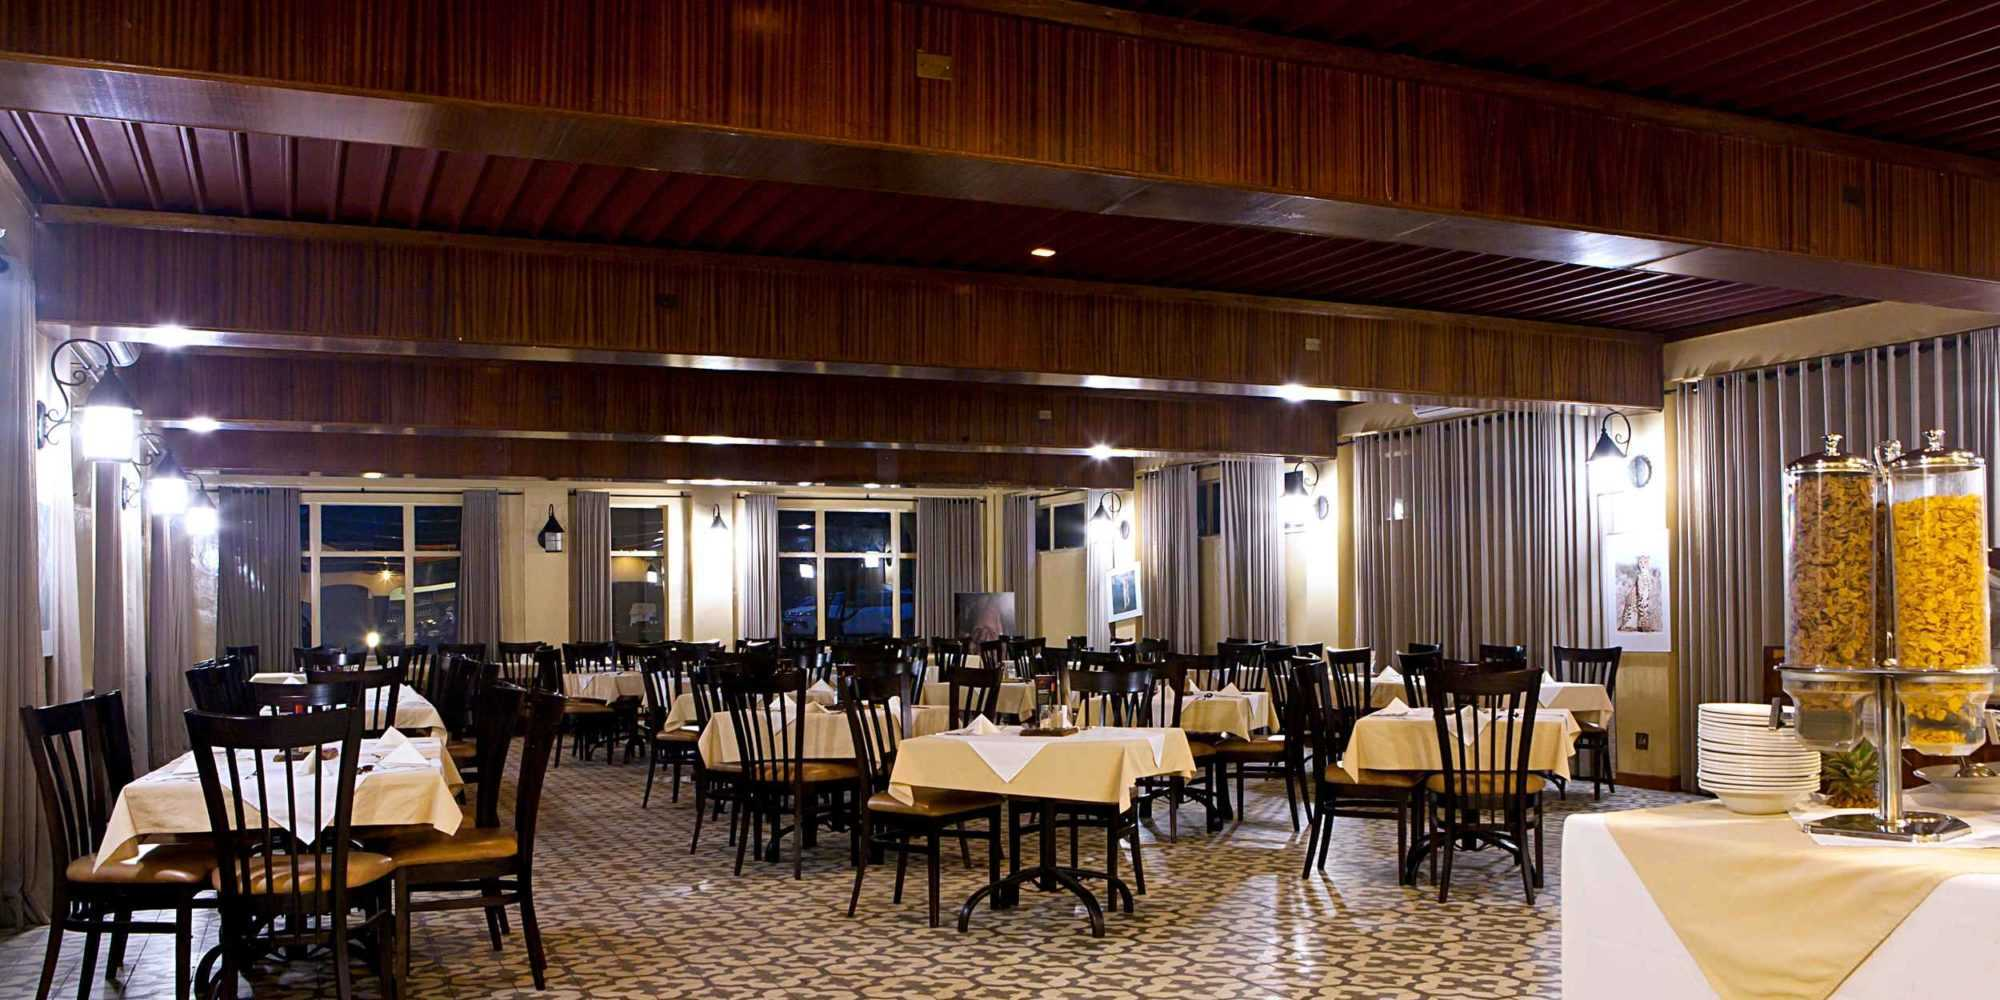 Namutoni Restaurant 07 © NWR 2017